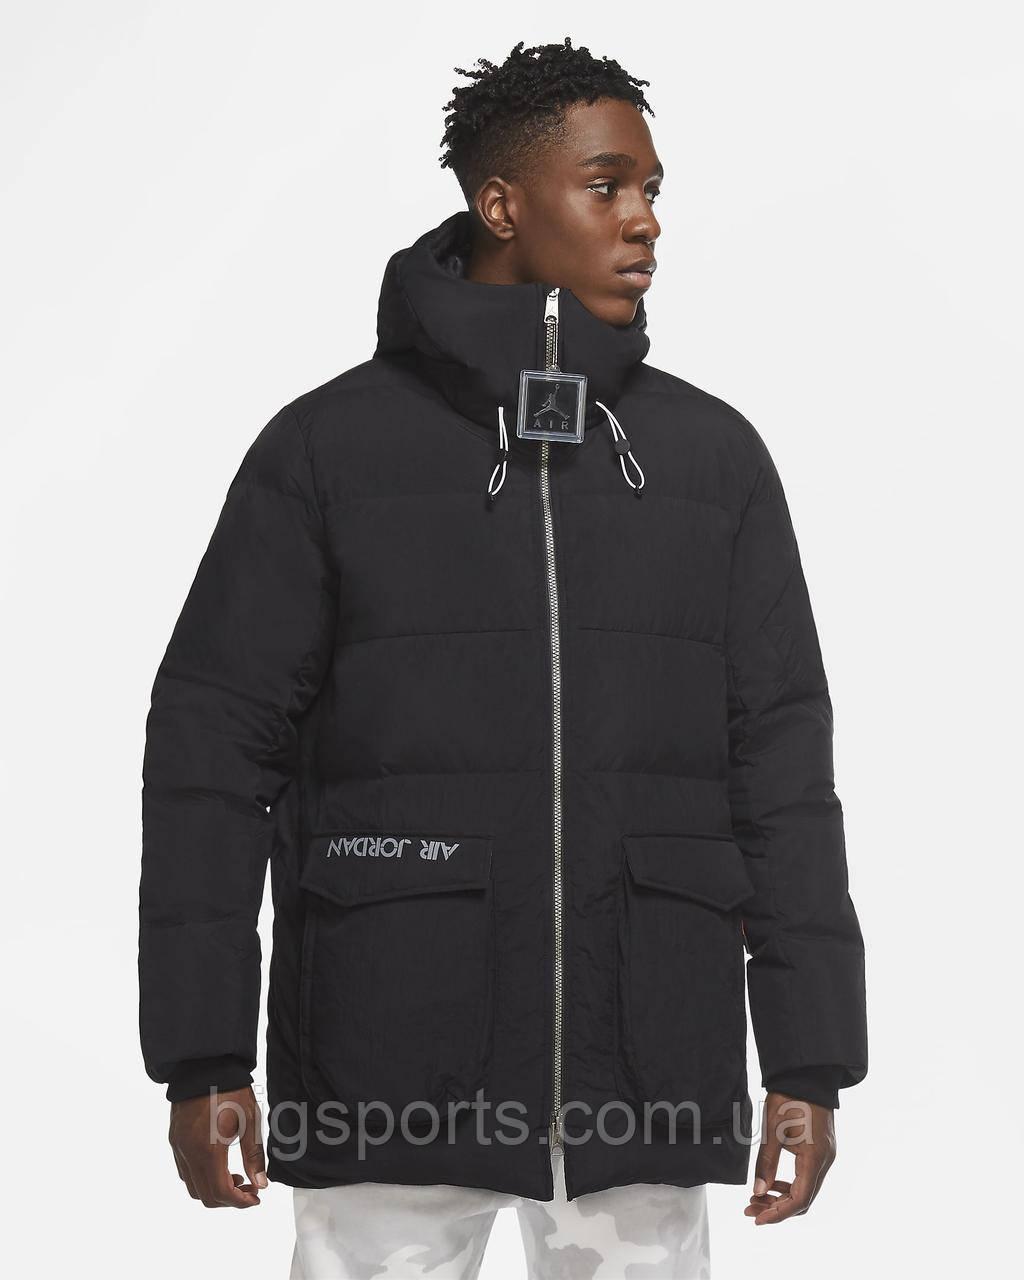 Куртка муж. Nike Jordan Down Parka (арт. CK6661-010)